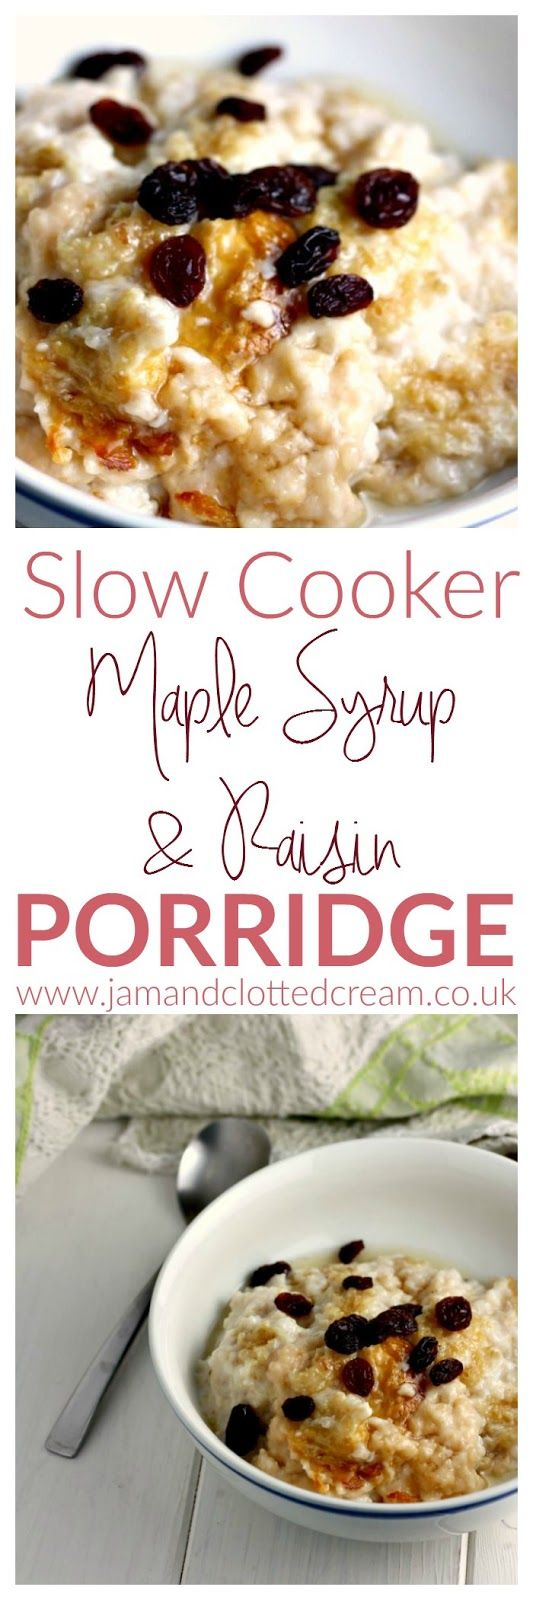 Slow Cooker Maple and Raisin Porridge